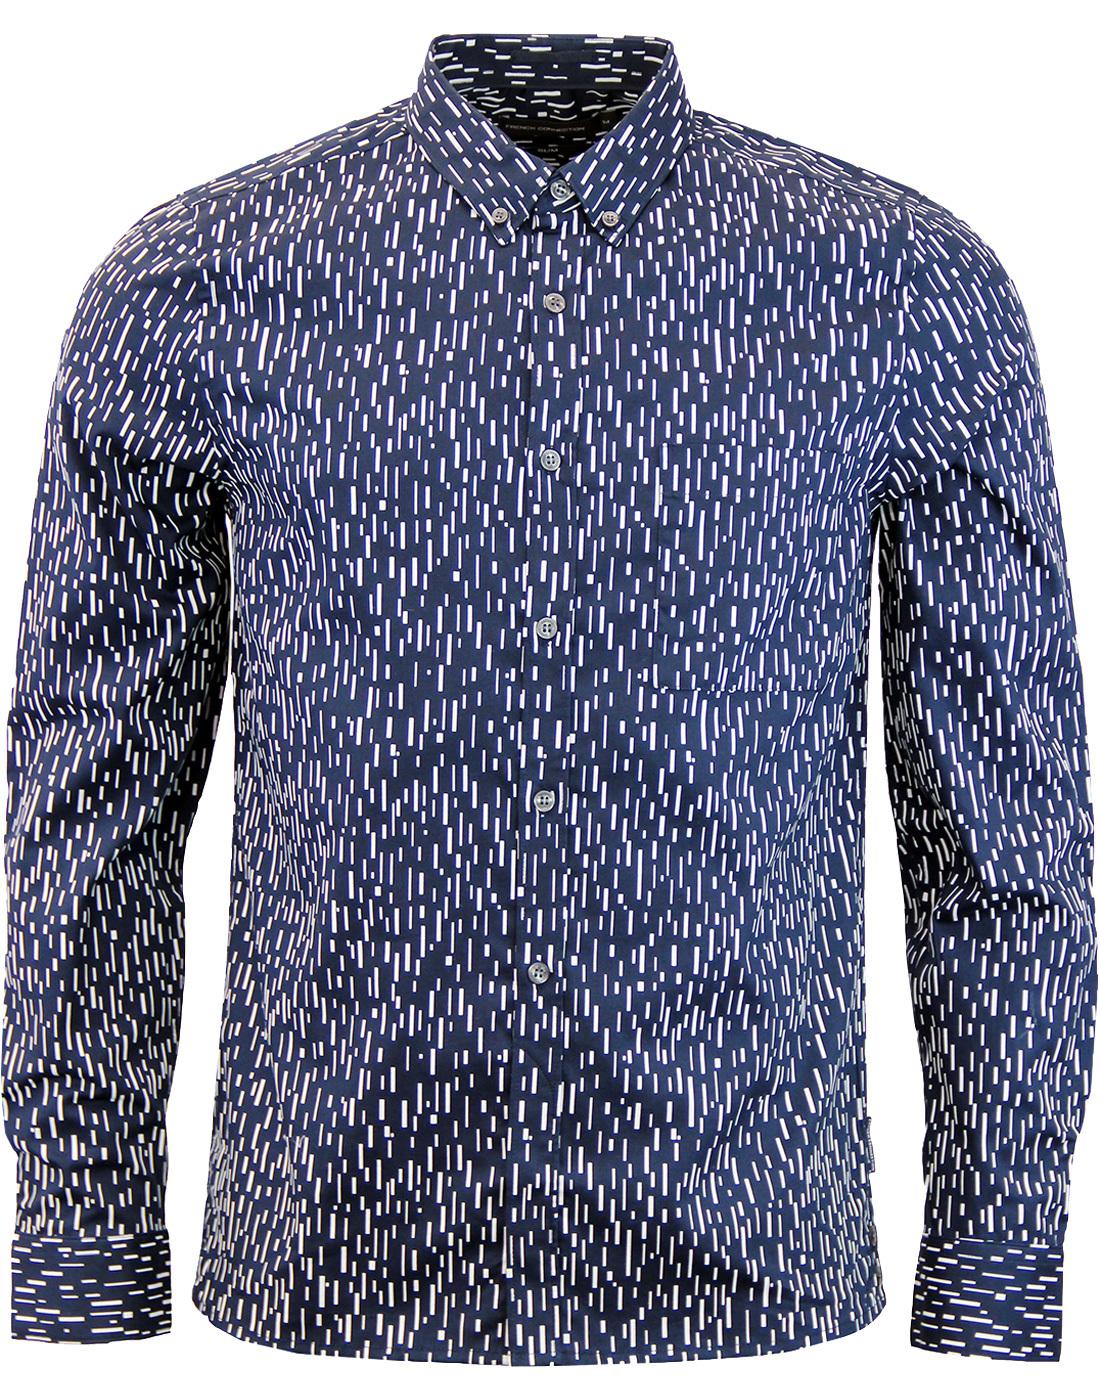 FRENCH CONNECTION 60s Rain Dash Oxford Shirt